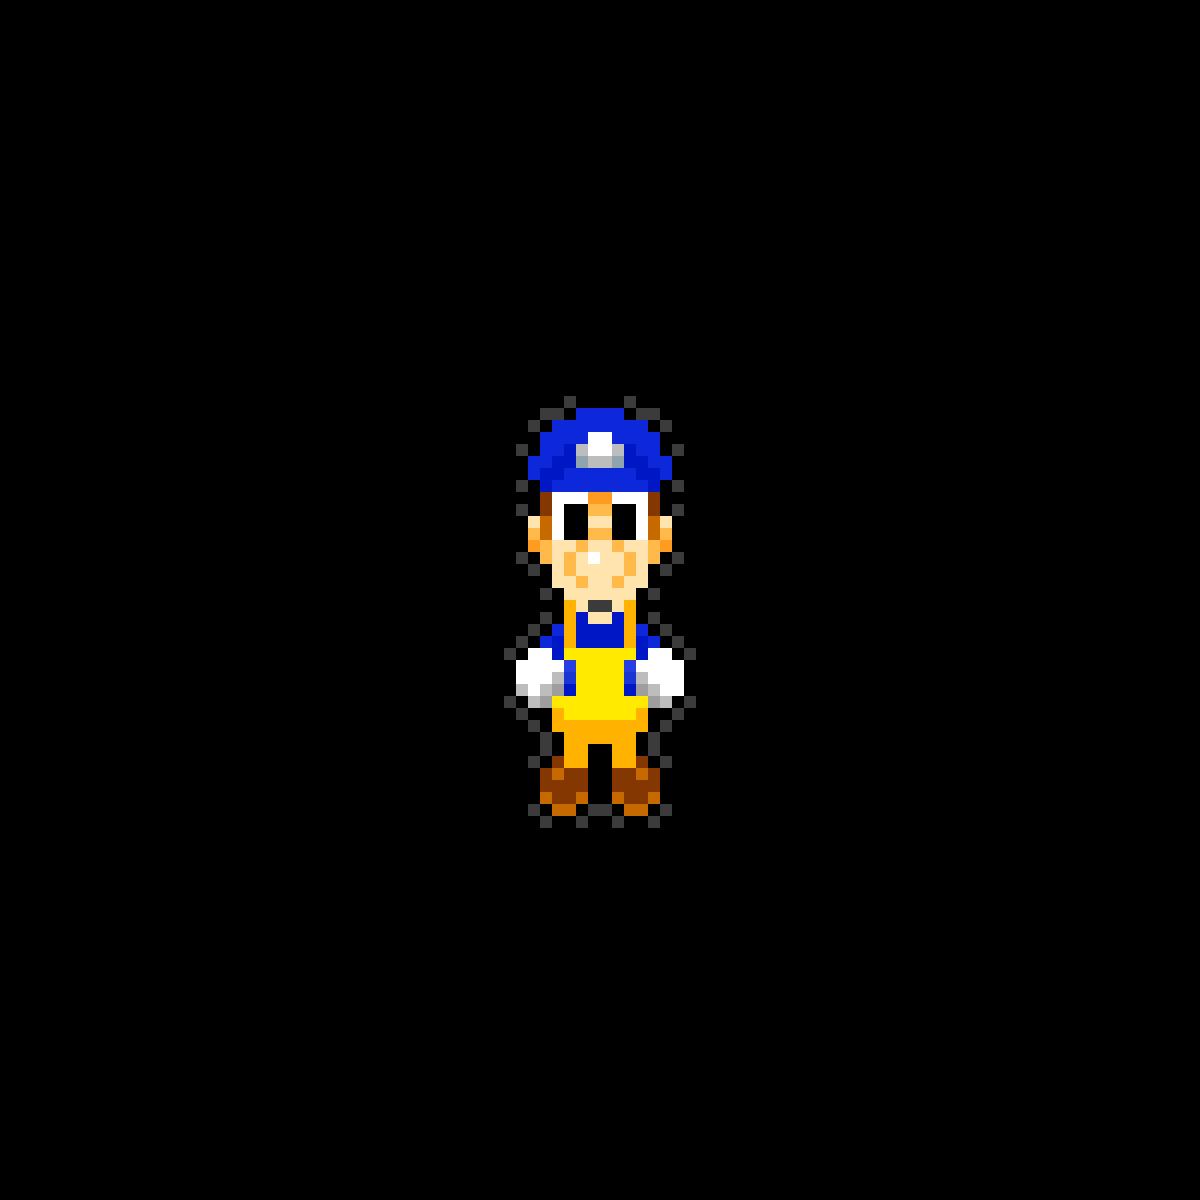 main-image-UNDER and Luigi - Superstar Saga  by UNDERNightPlumb